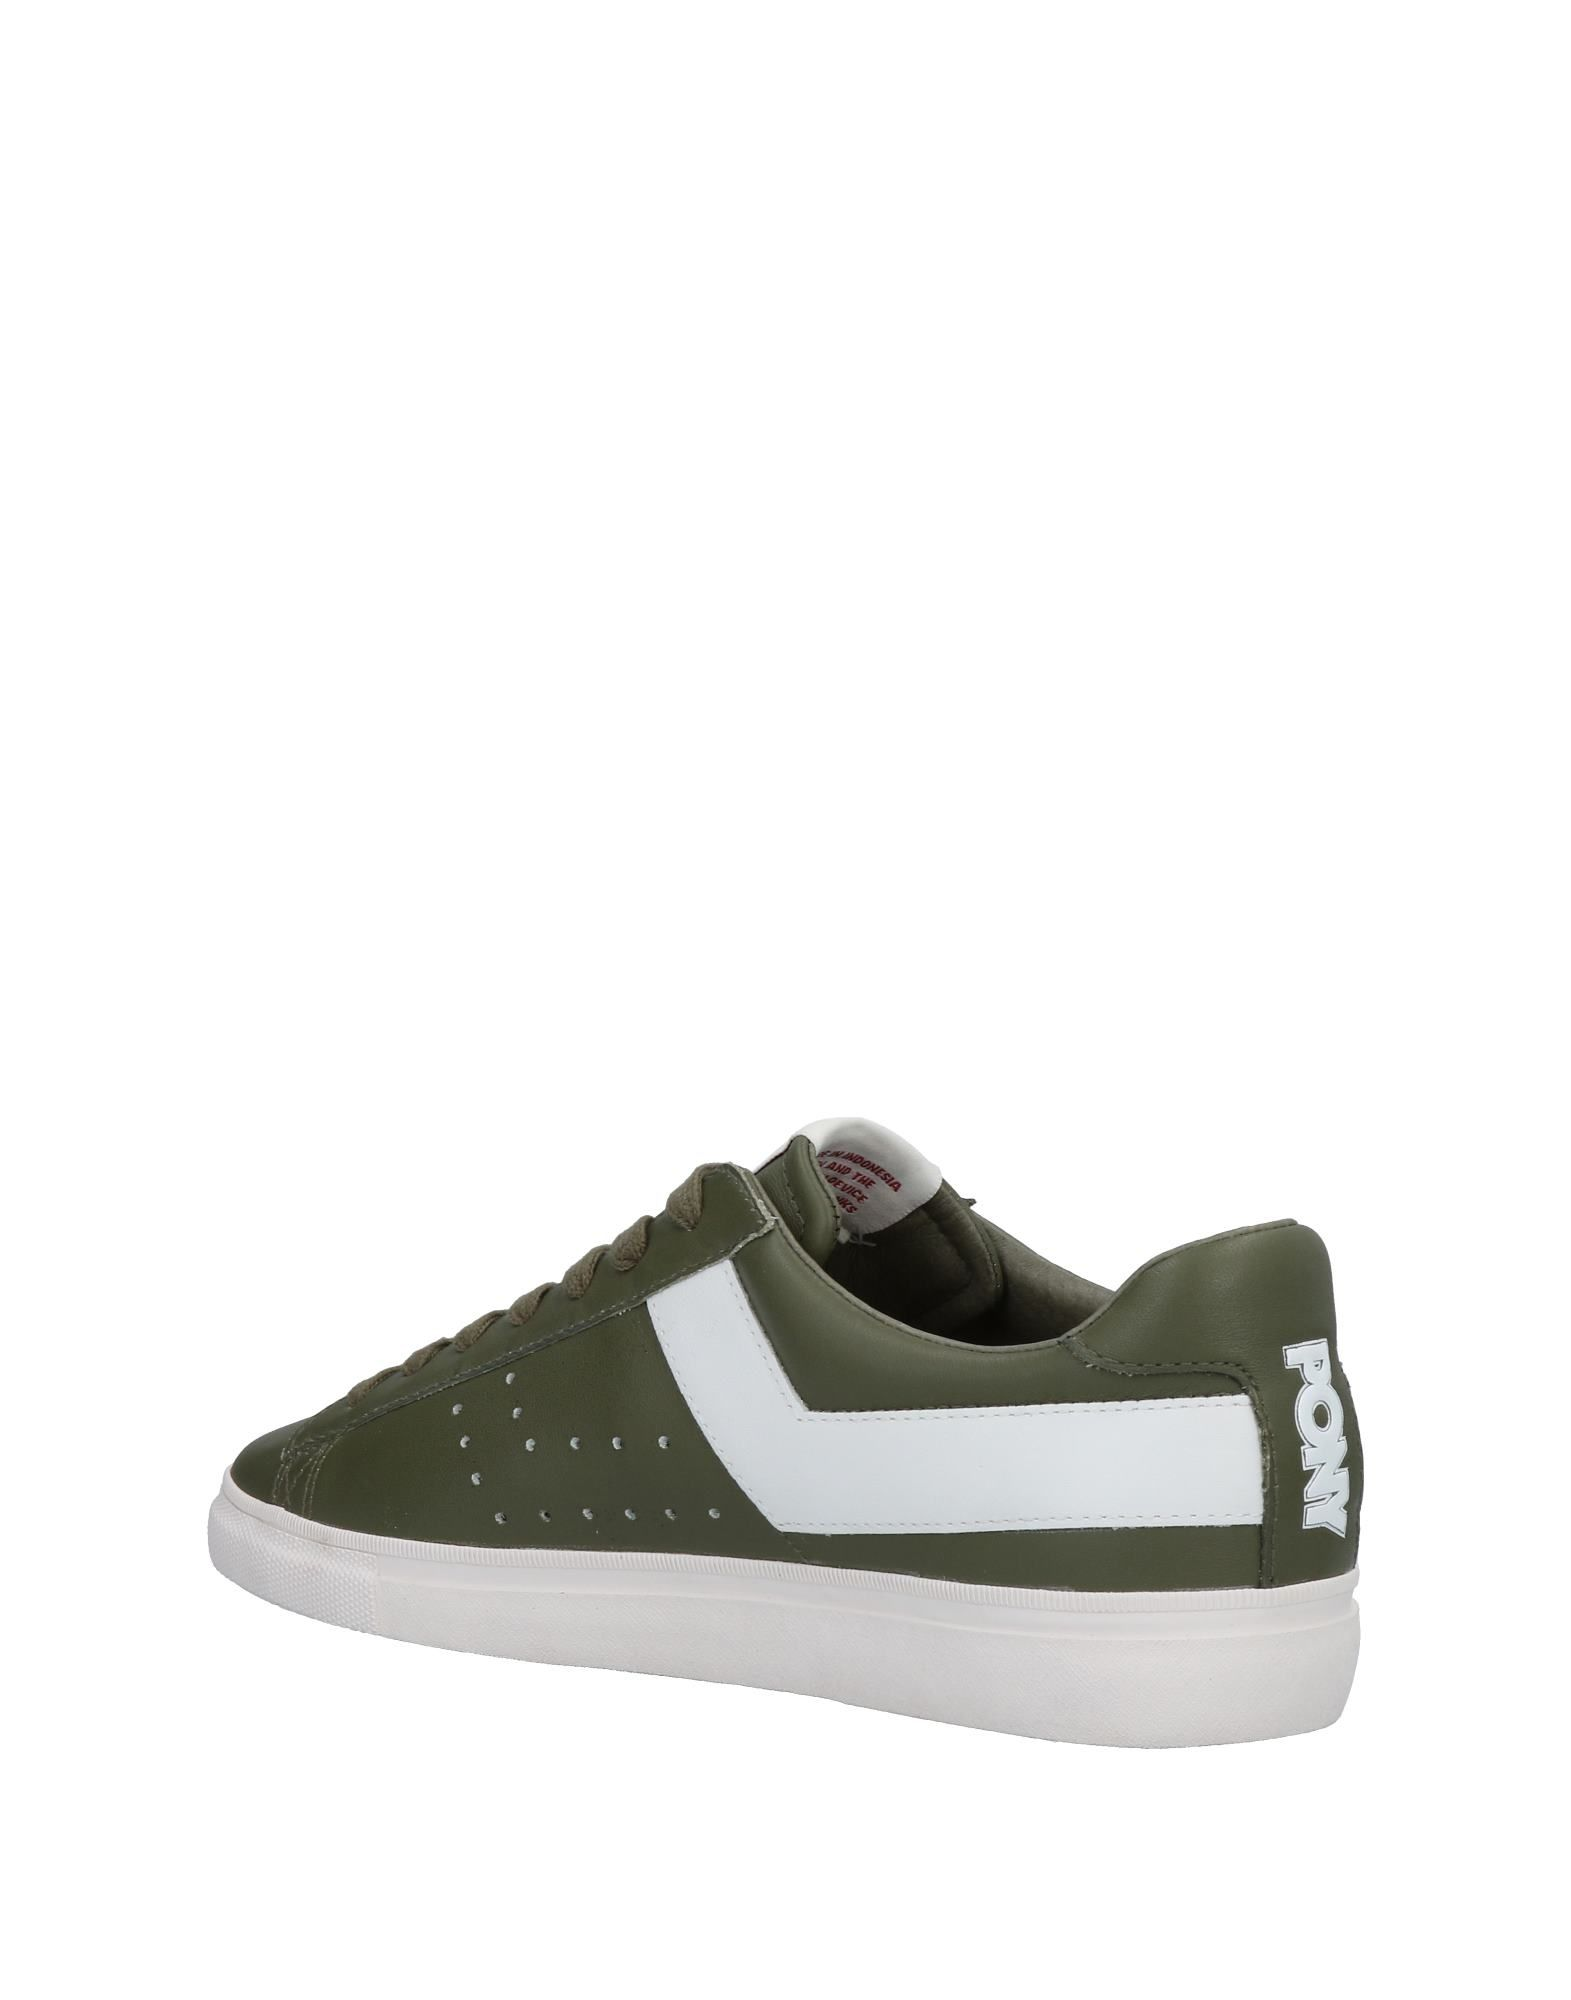 Pony Sneakers Herren  Heiße 11485340KW Heiße  Schuhe bae95e